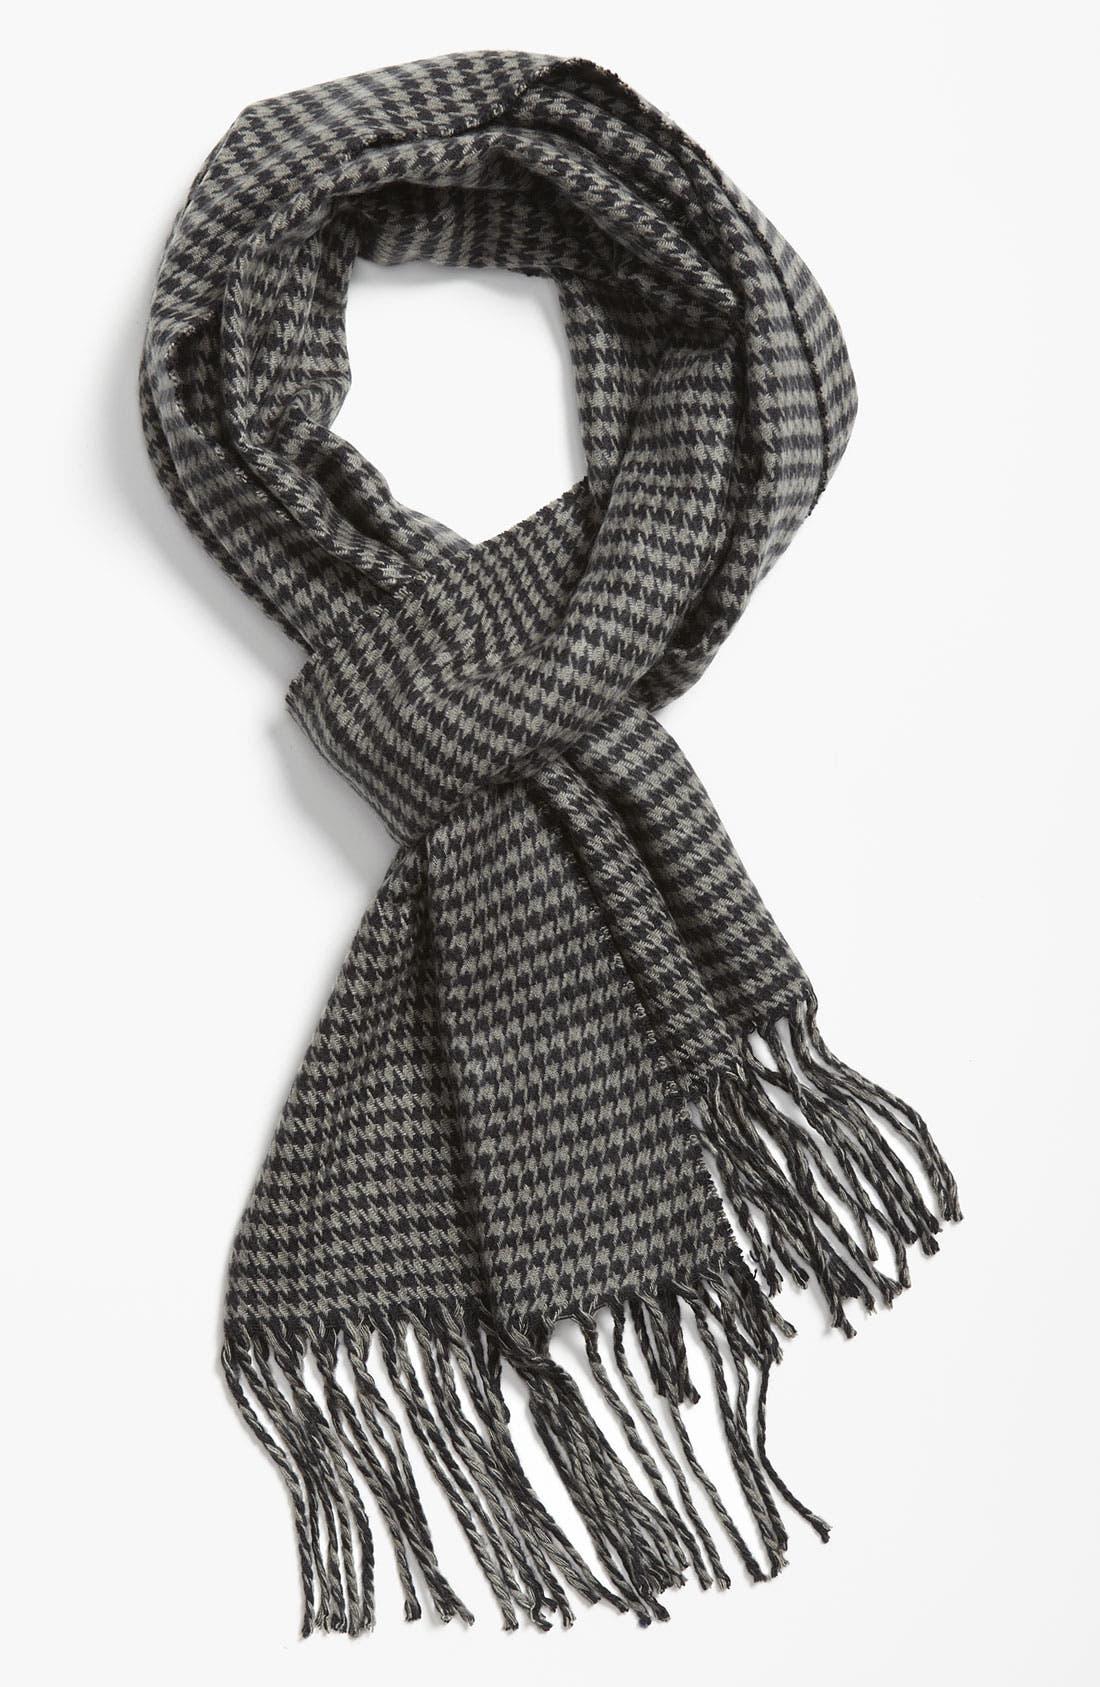 Mini Houndstooth Knit Scarf,                             Main thumbnail 1, color,                             Black/ Grey